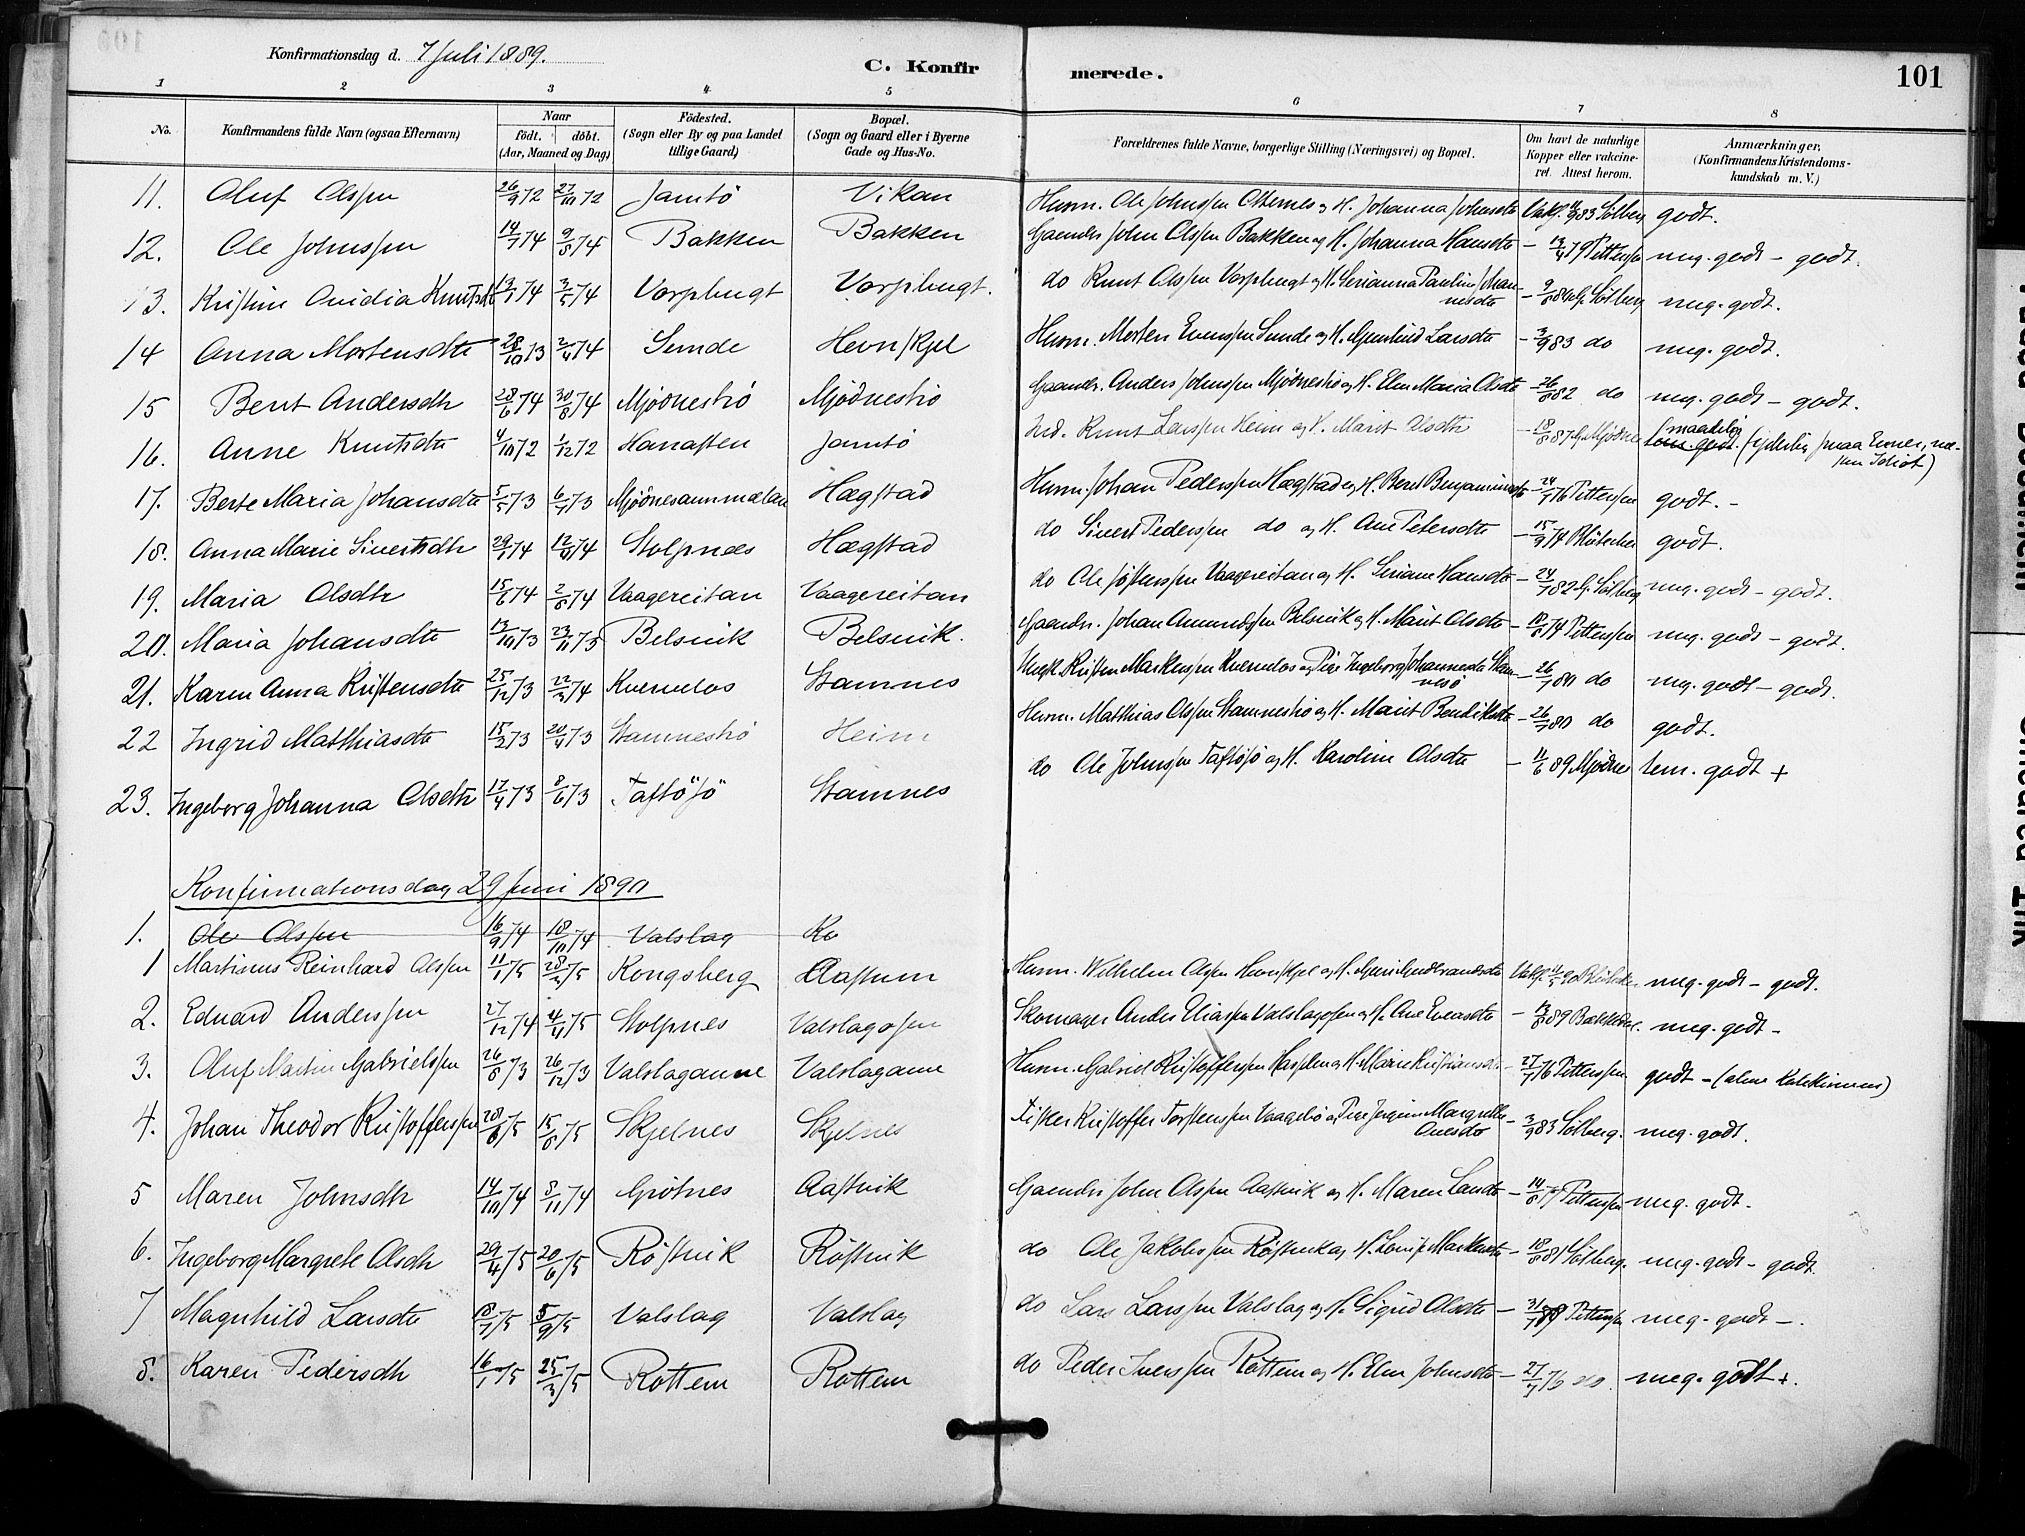 SAT, Ministerialprotokoller, klokkerbøker og fødselsregistre - Sør-Trøndelag, 633/L0518: Parish register (official) no. 633A01, 1884-1906, p. 101